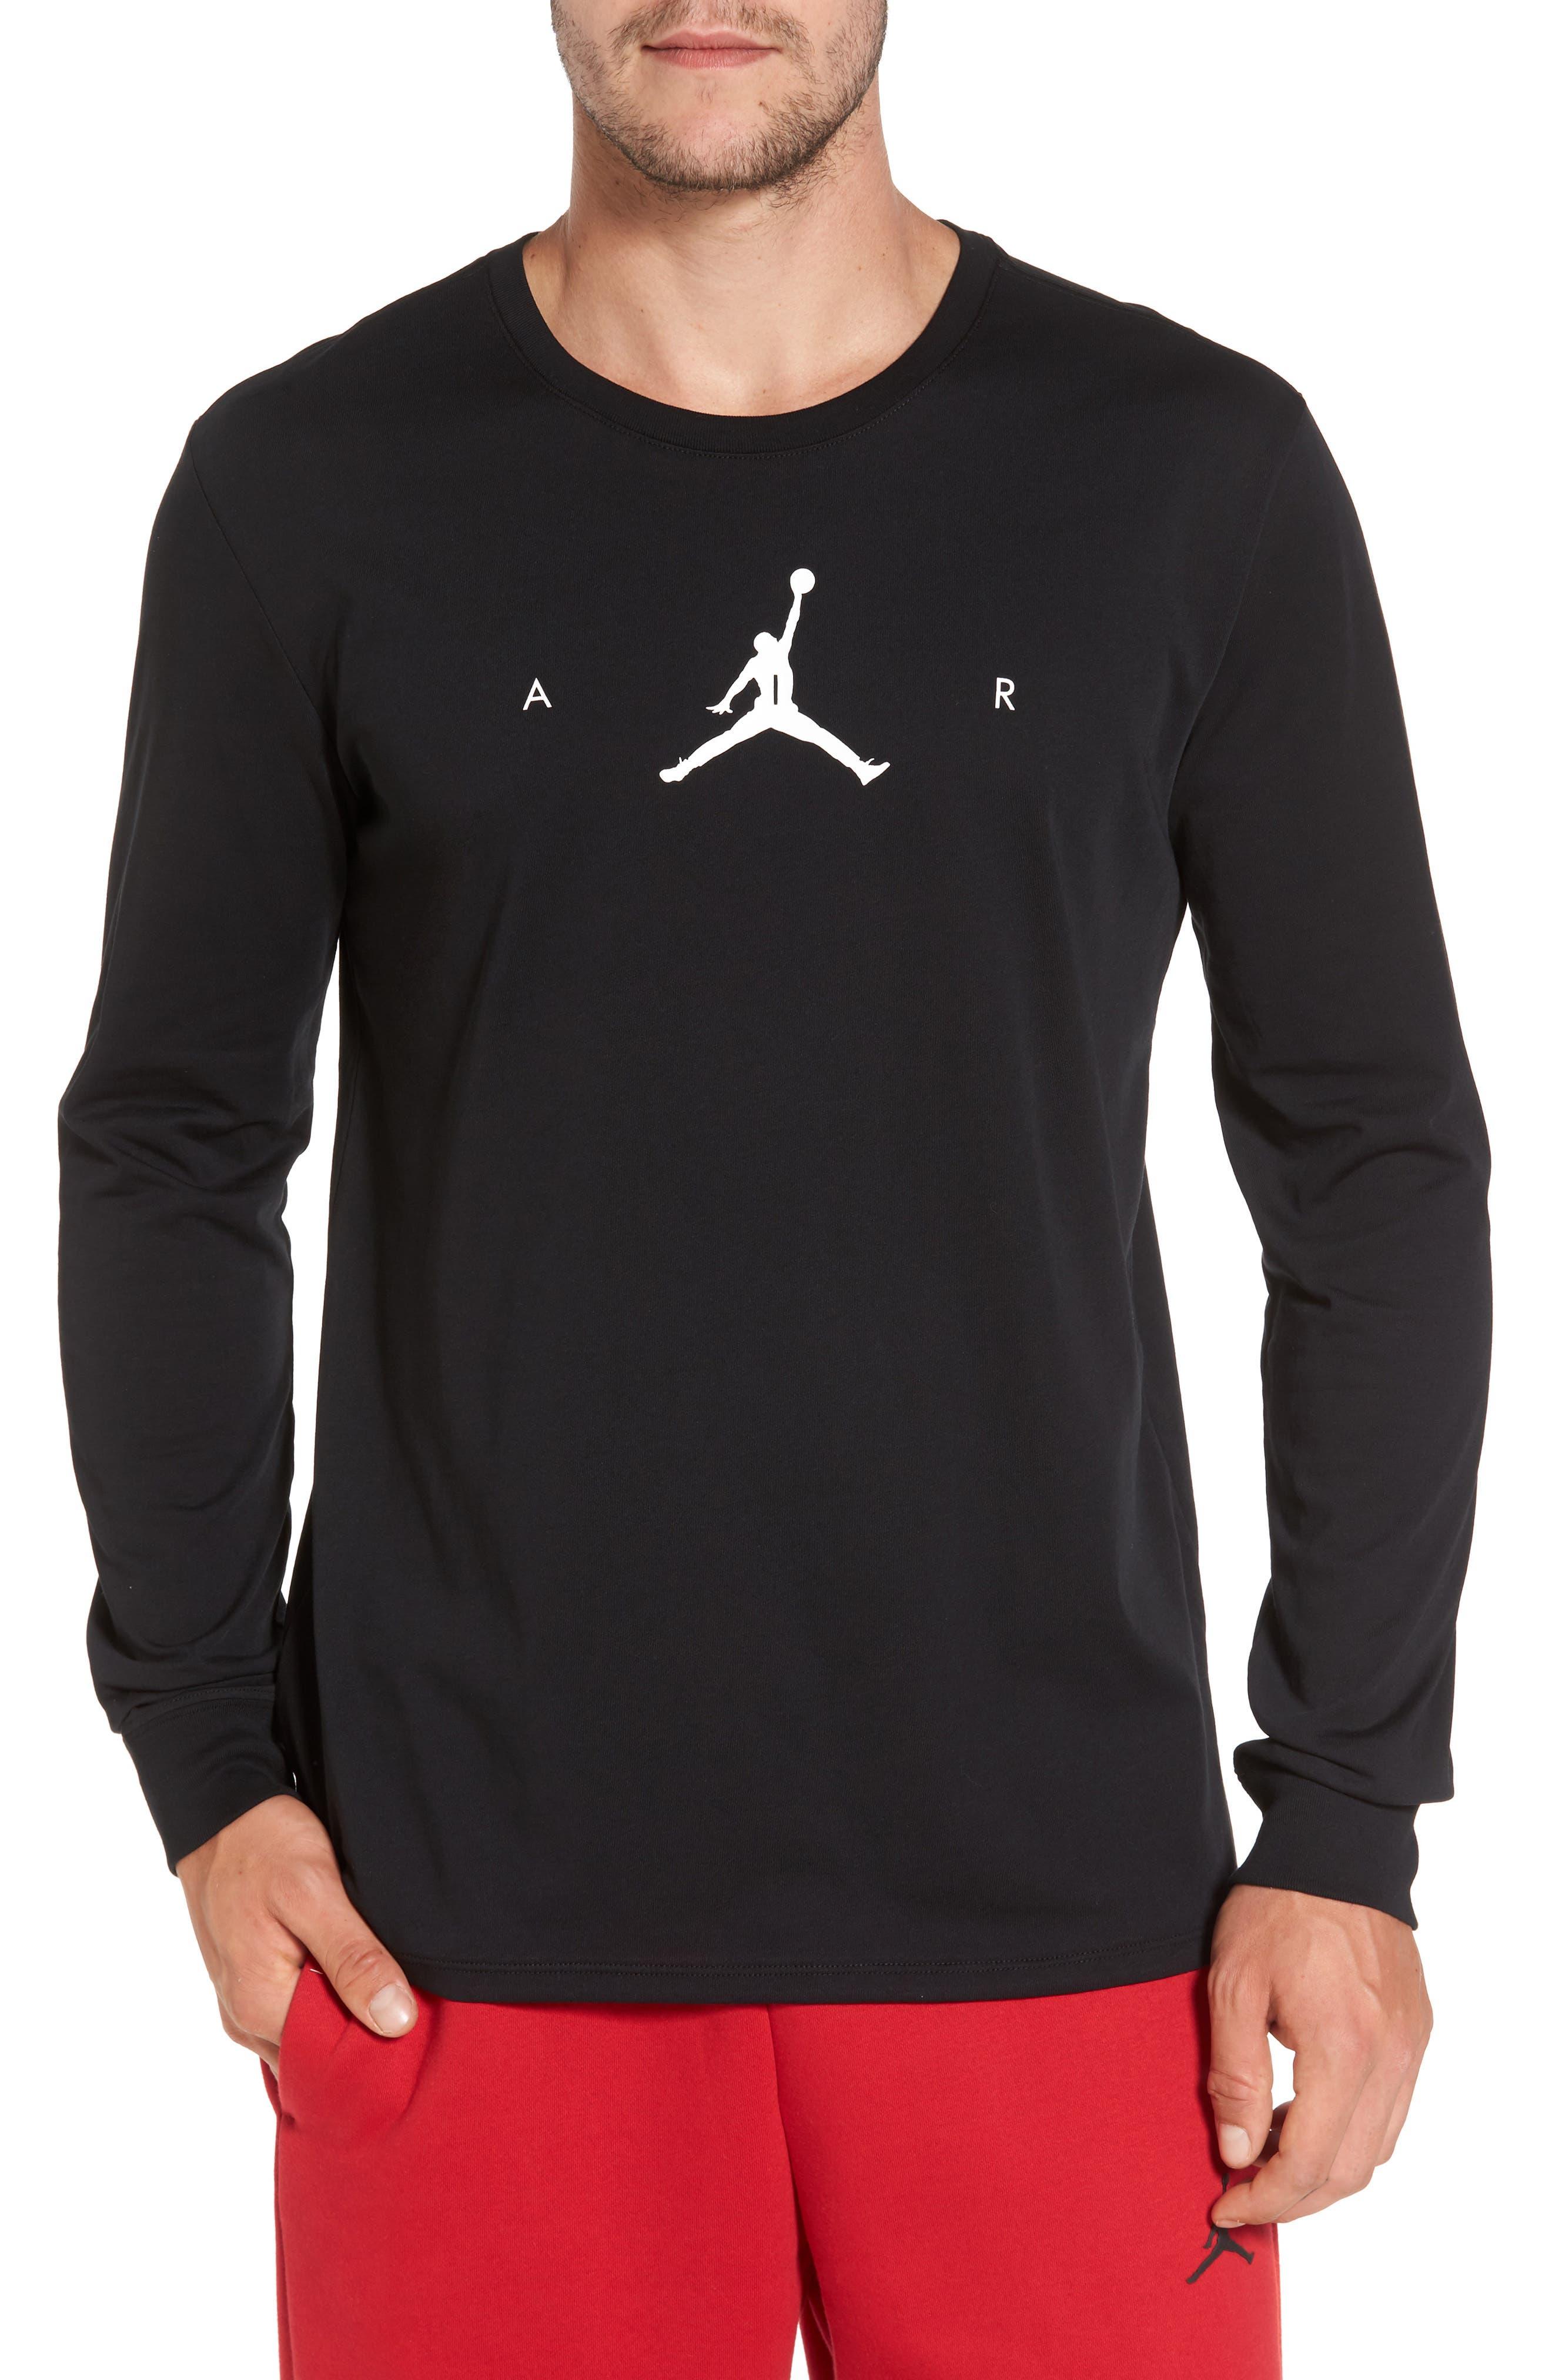 Flight Dry-FIT T-Shirt,                         Main,                         color, 010